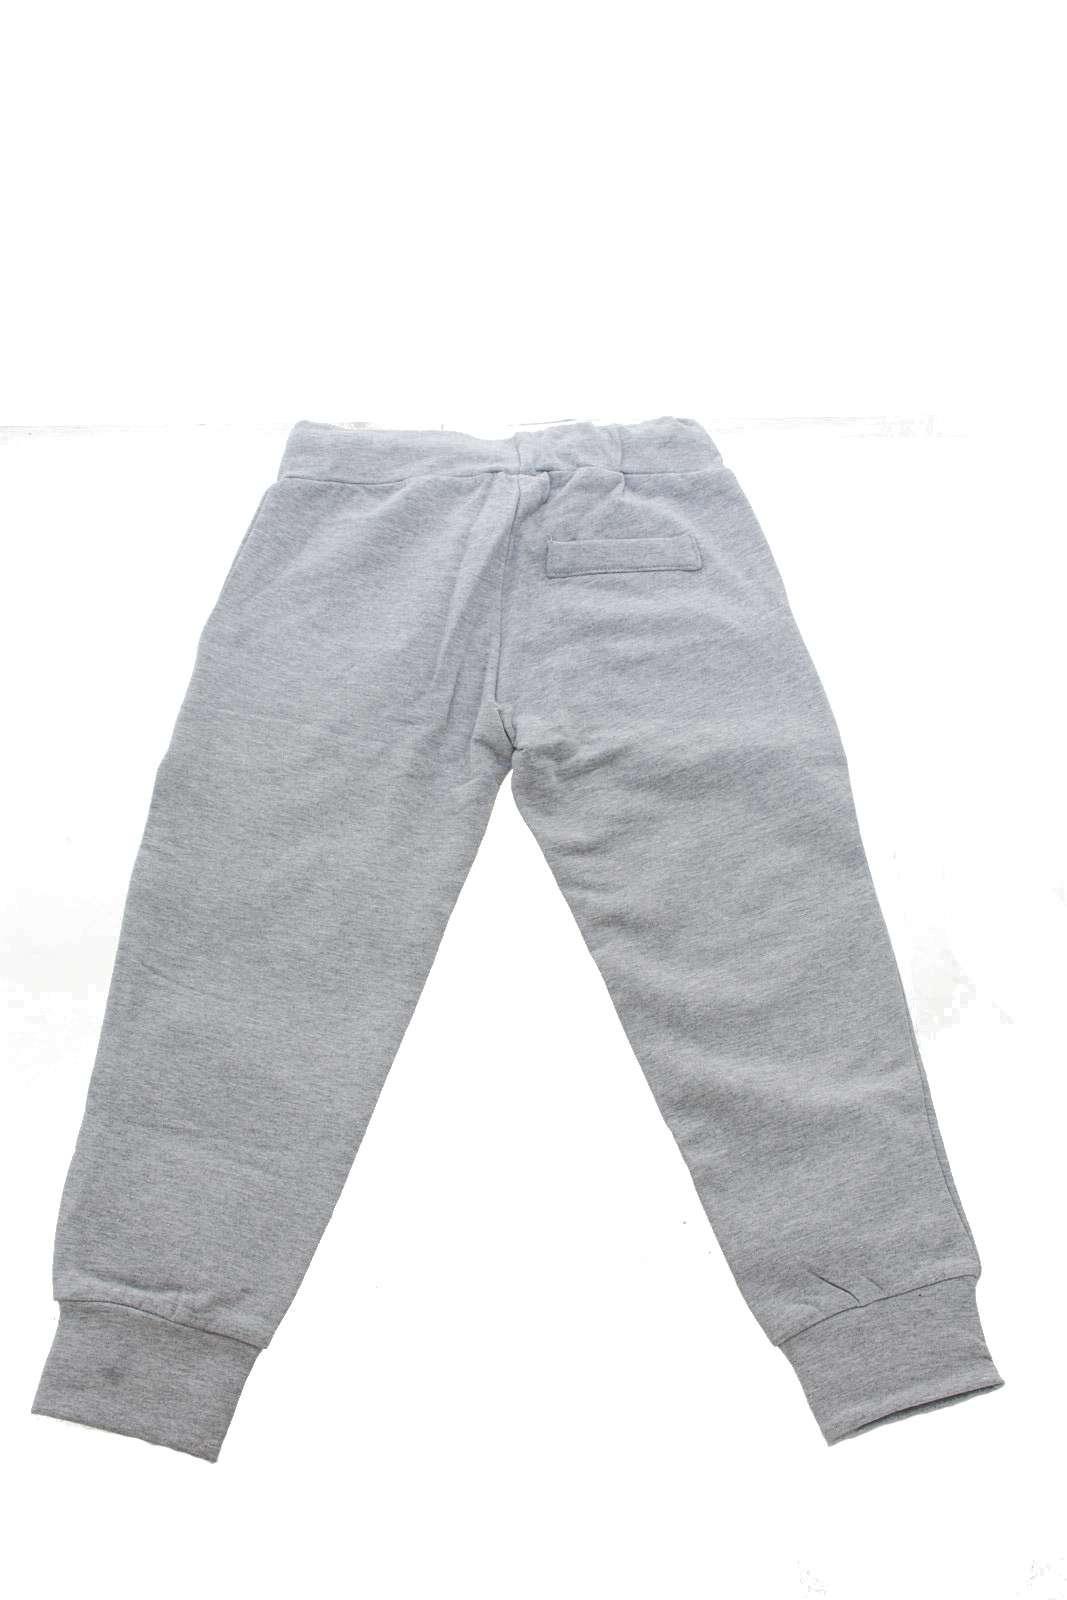 https://www.parmax.com/media/catalog/product/a/i/AI-outley_parmax-pantaloni-bambina-Silvia%20Heach-skbif0007-B.jpg